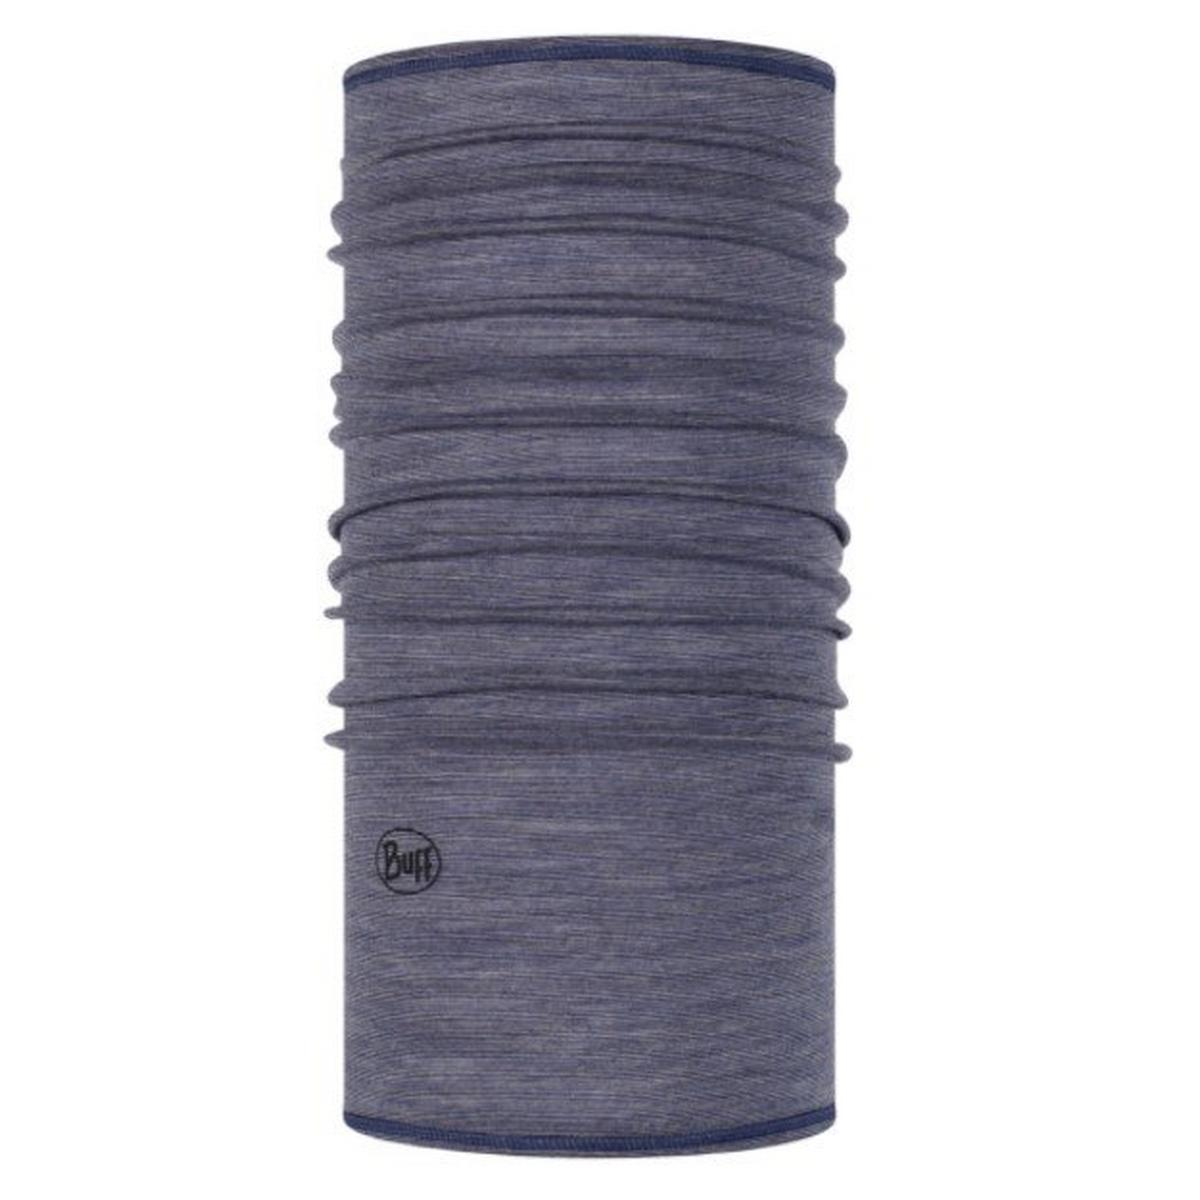 Buff Unisex Lightweight Merino Buff - Blue